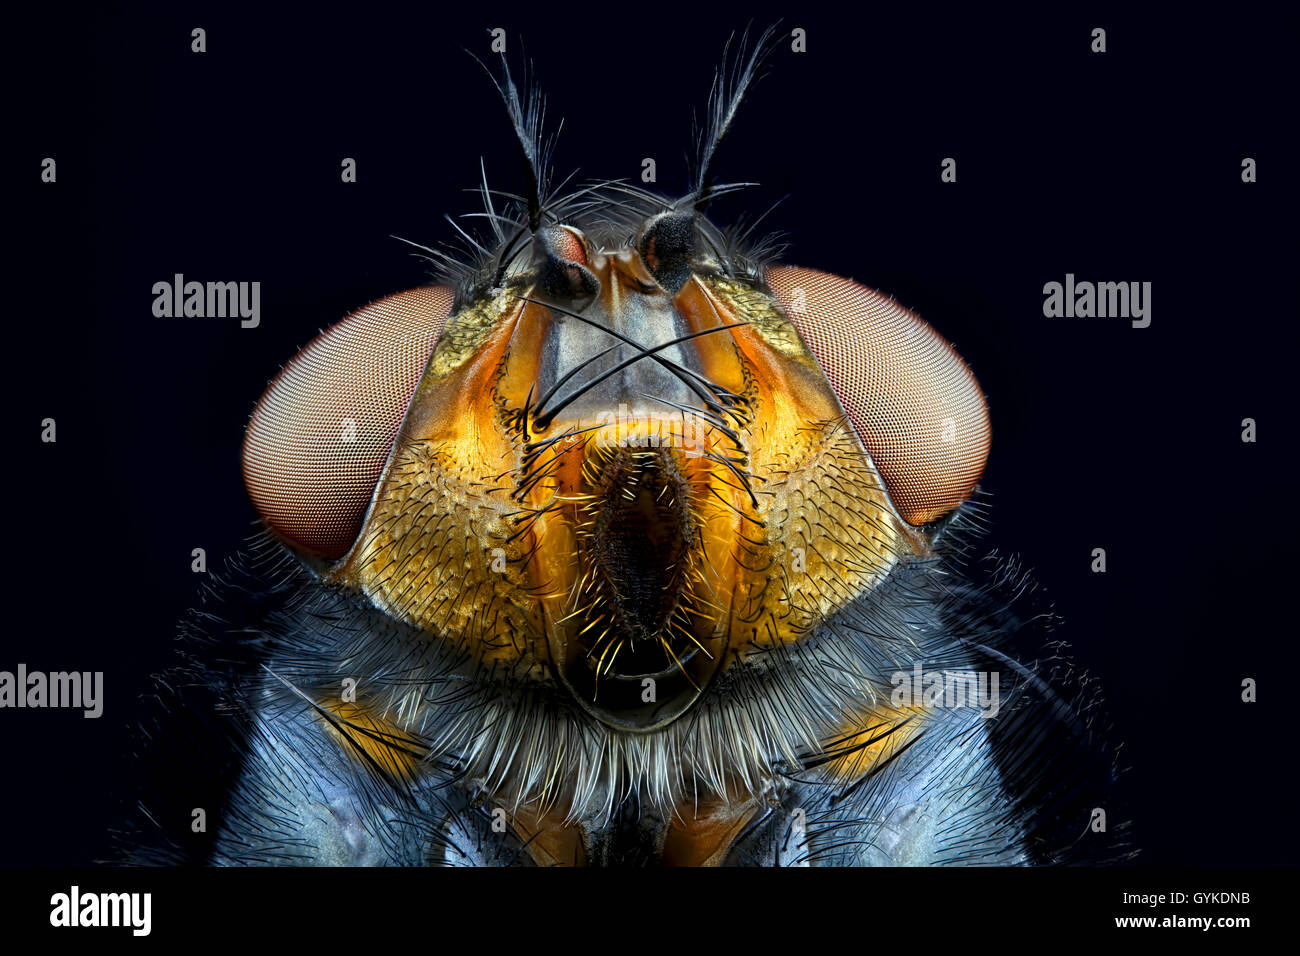 Blaue Schmeissfliege (Calliphora vicina), Portraet | bottlefly (Calliphora vicina), portrait | BLWS419003.jpg [ - Stock Image